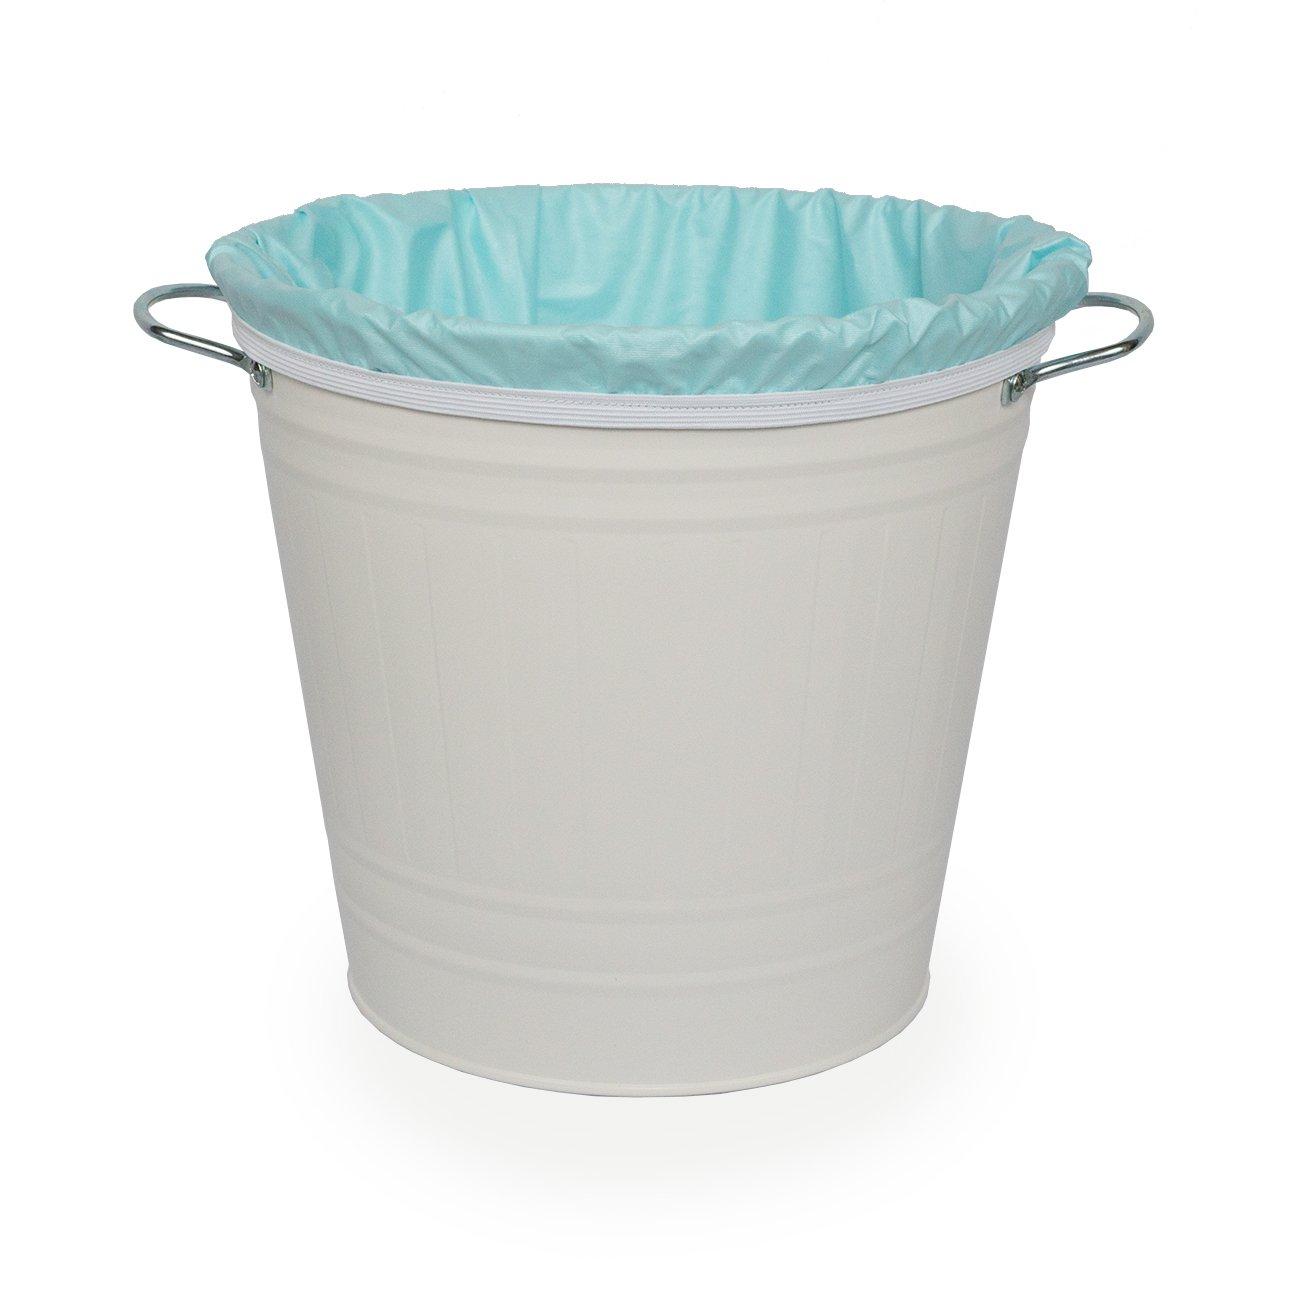 Thirsties Diaper Mini Pail Liner - Aqua